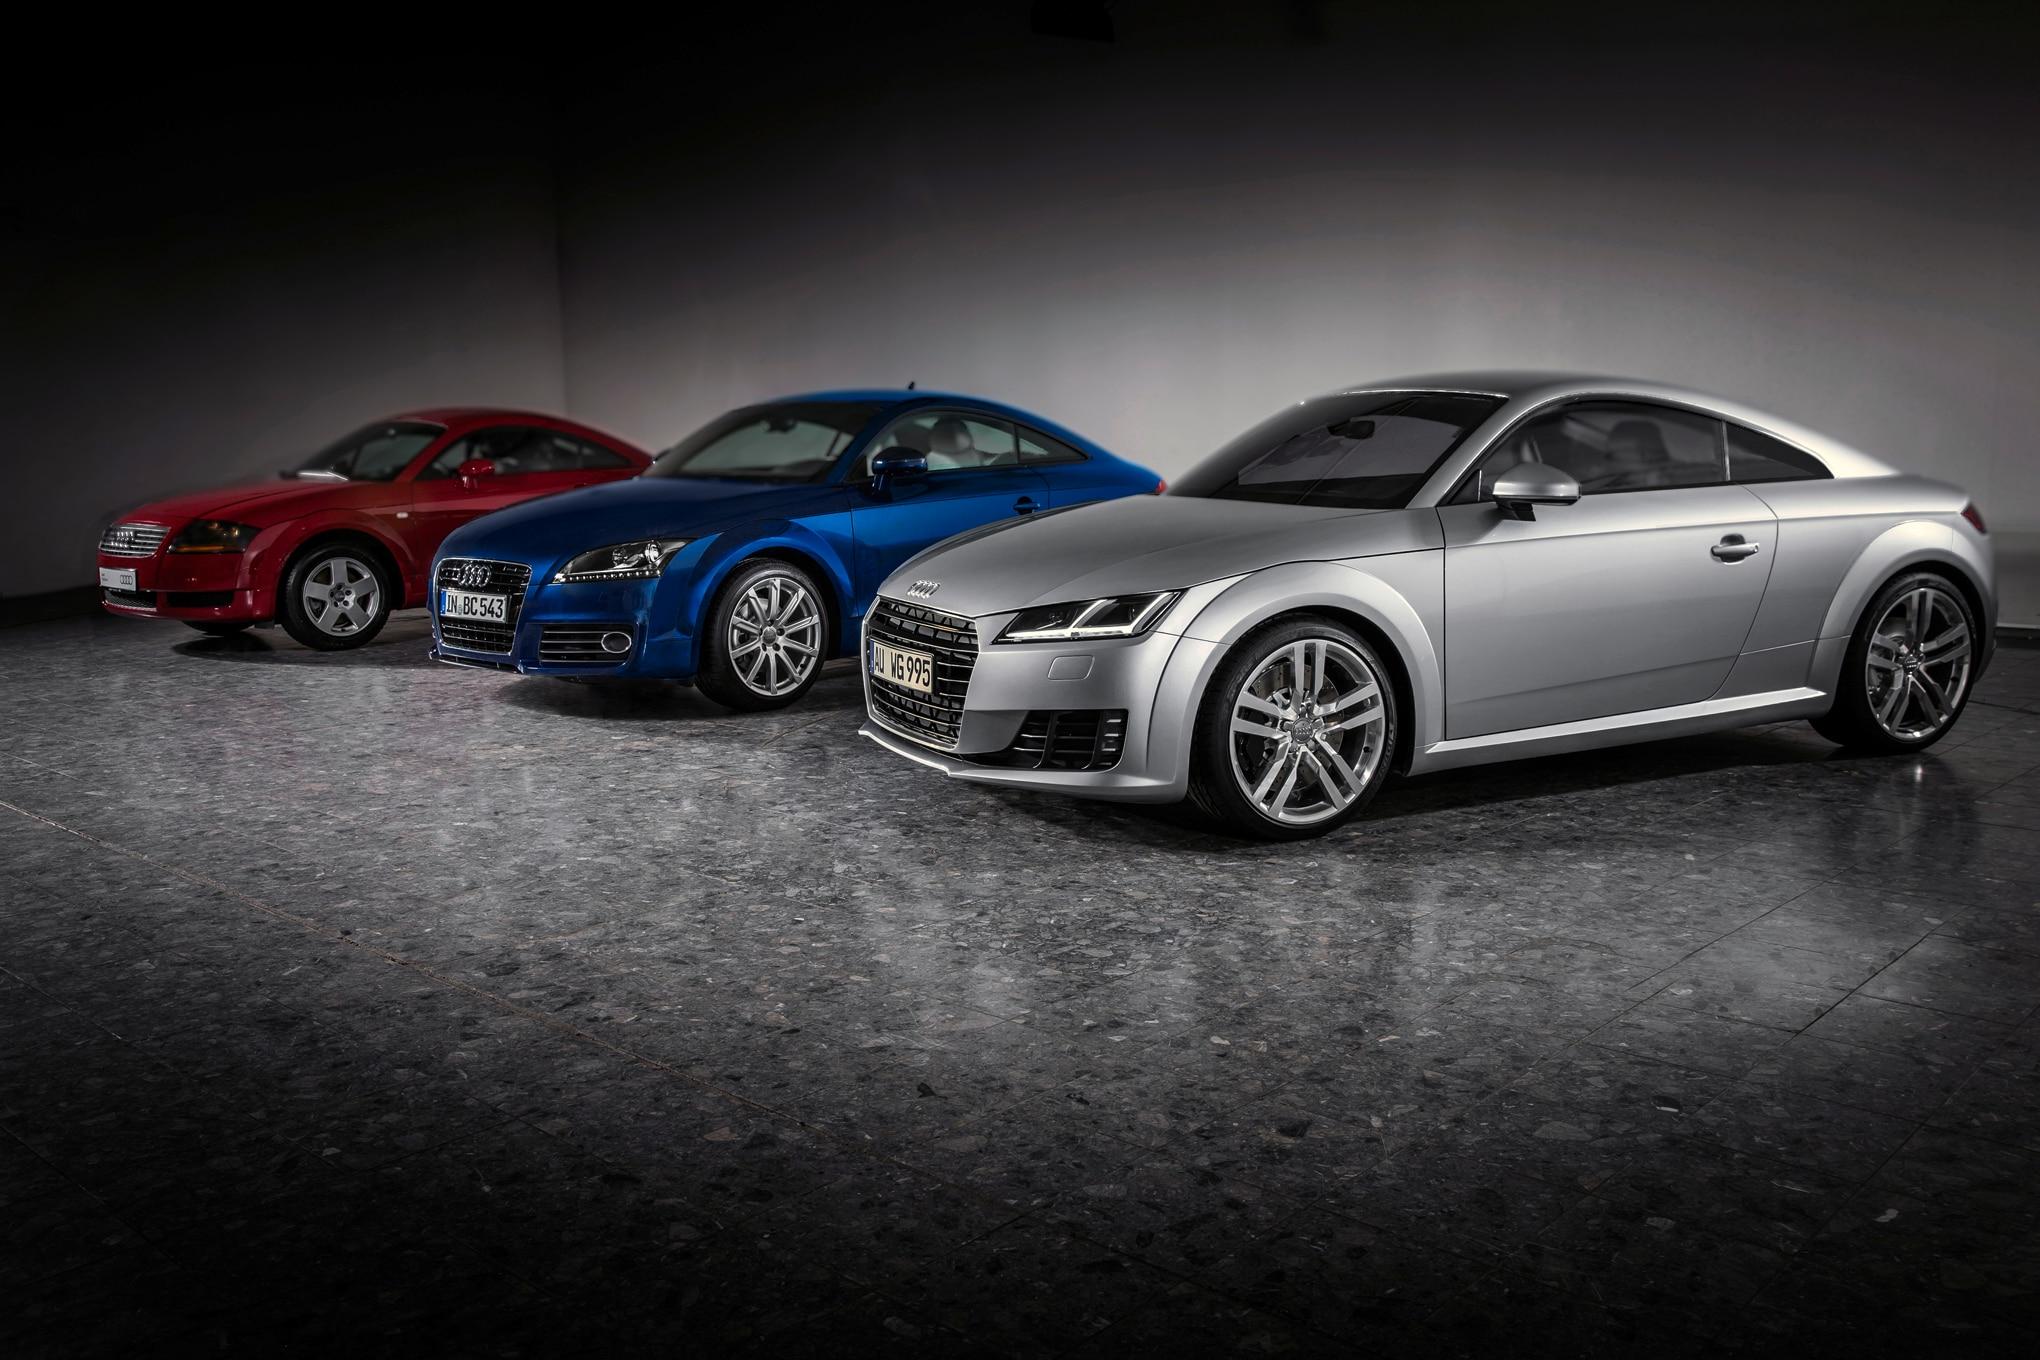 2016 Audi TT/TTS Roadster Review